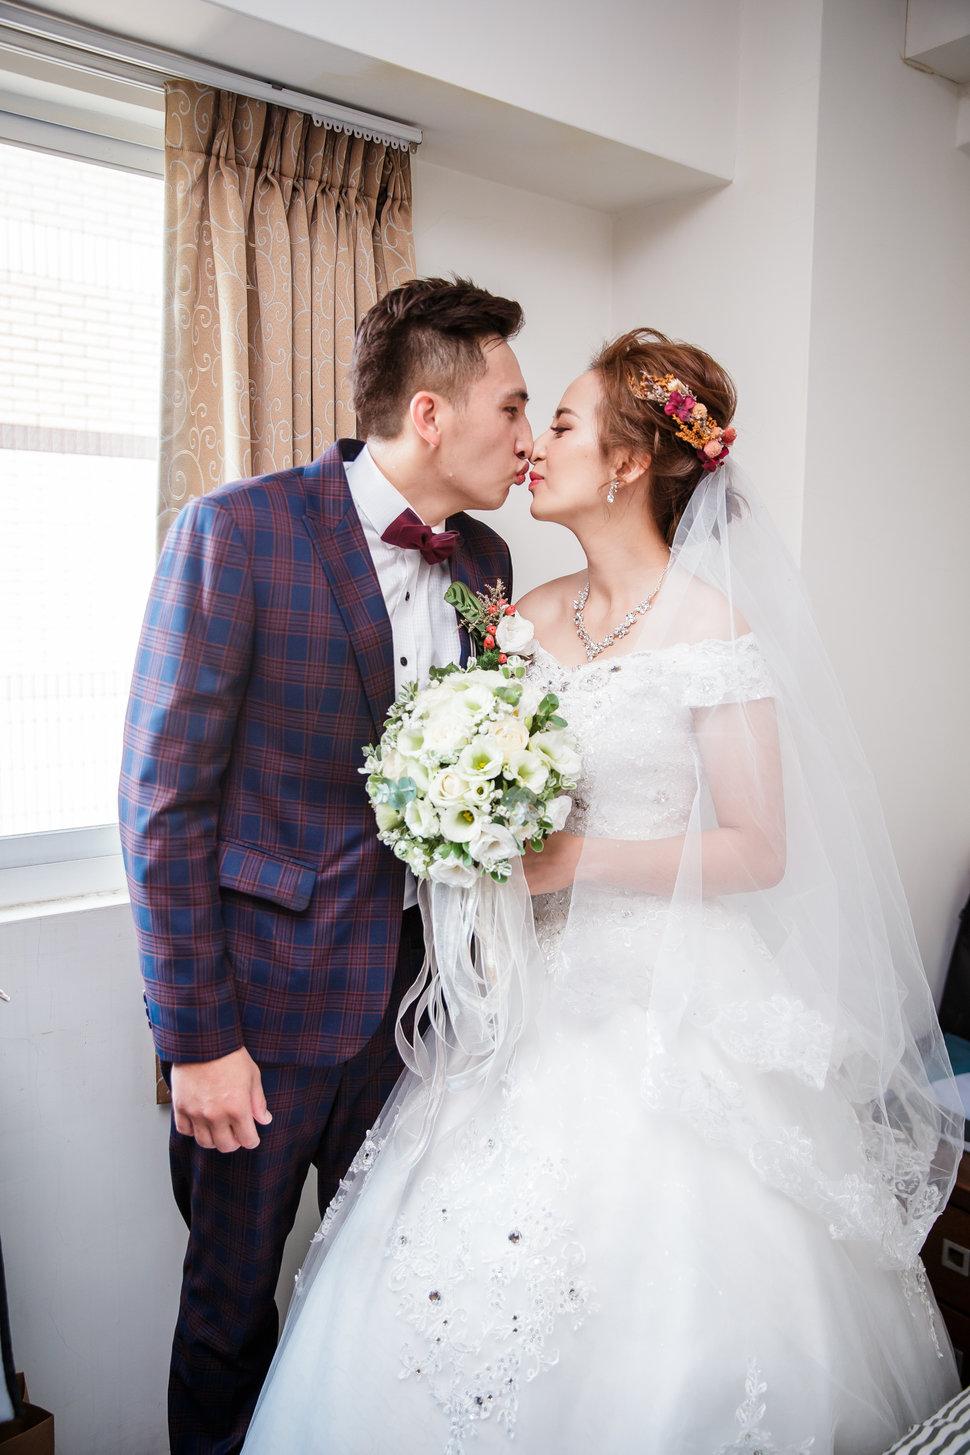 wedding-110 - J-Love 婚禮攝影團隊 - 結婚吧